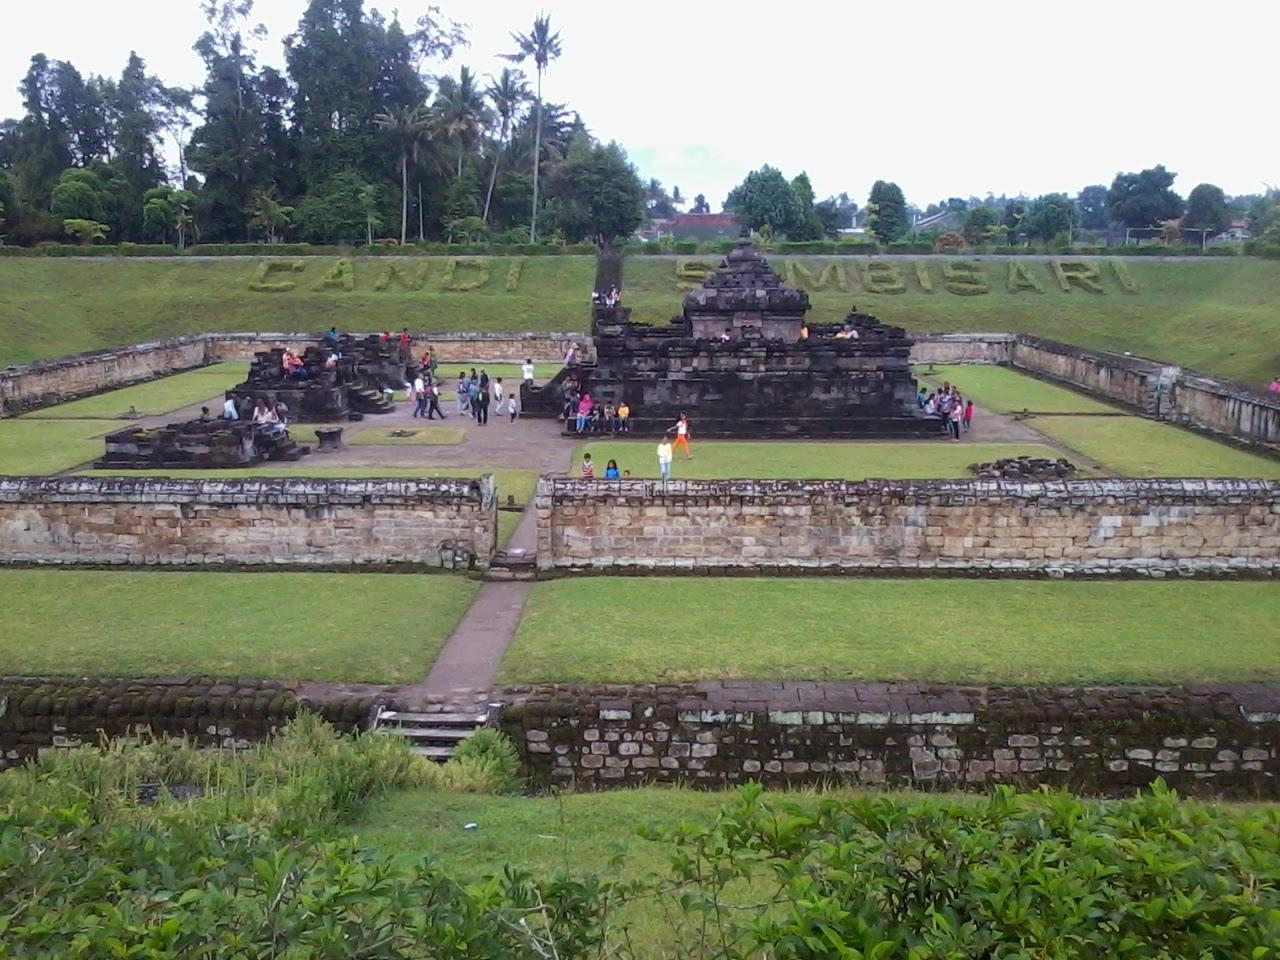 7 Lokasi Wisata di Jogja yang Menarik dan Wajib Anda Kunjungi